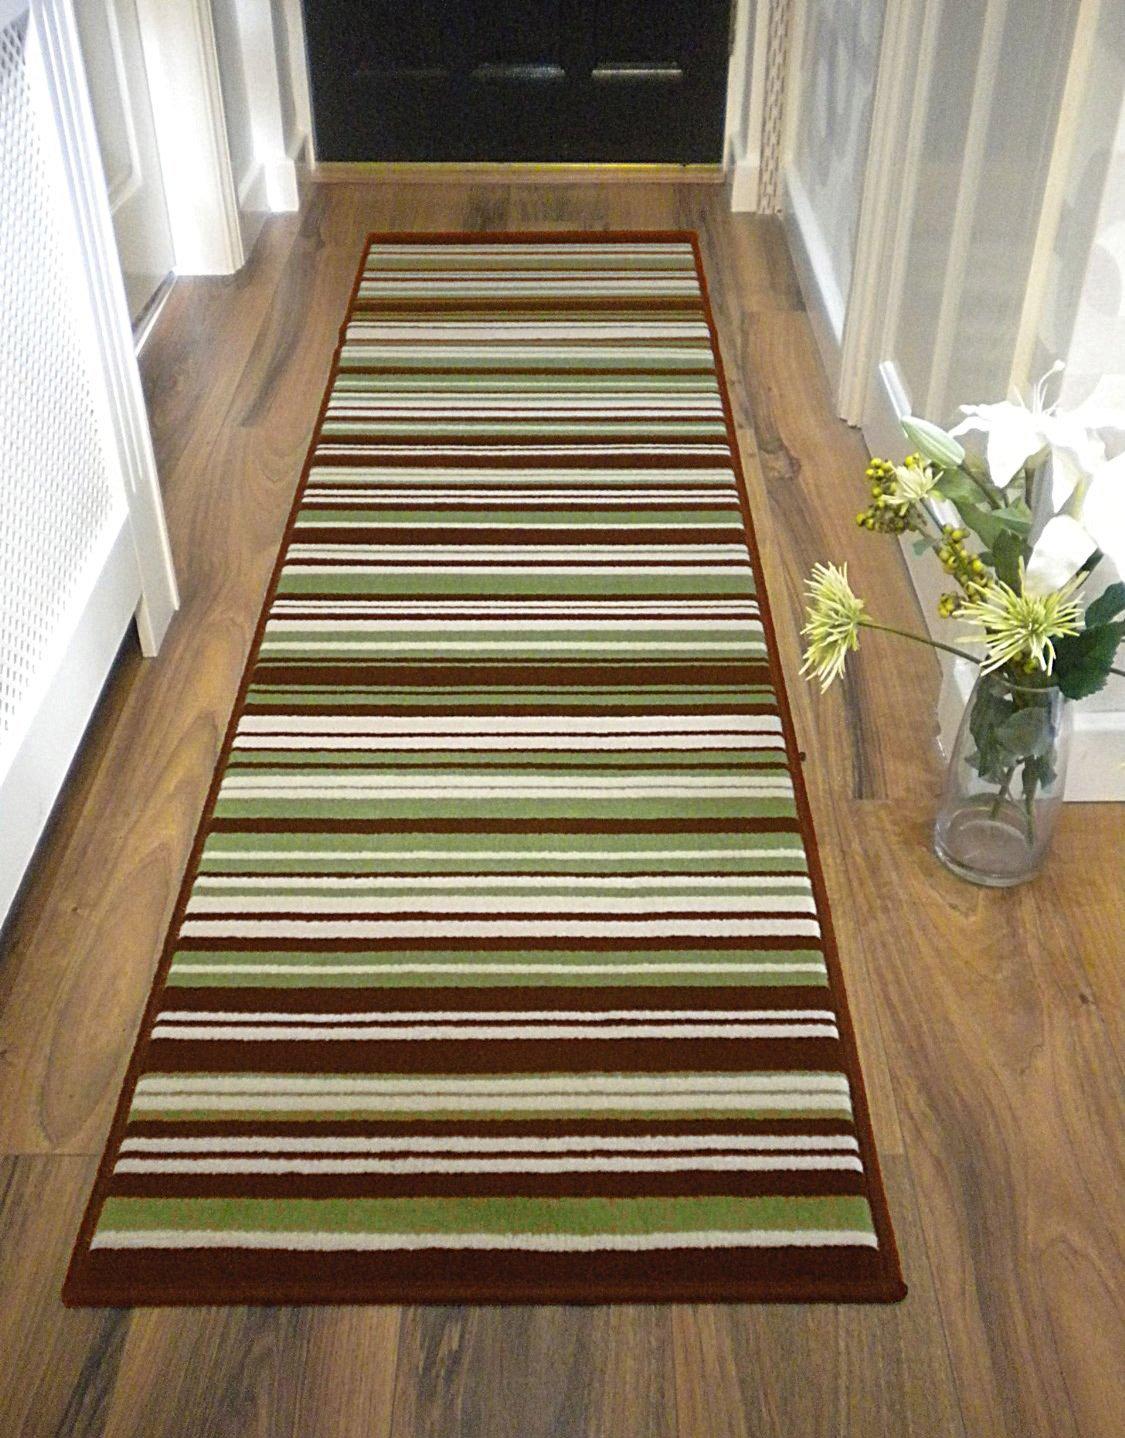 Large Modern Stripe Rug Green Brown Runner 60 cm x 220 cm (2'x 3 '4